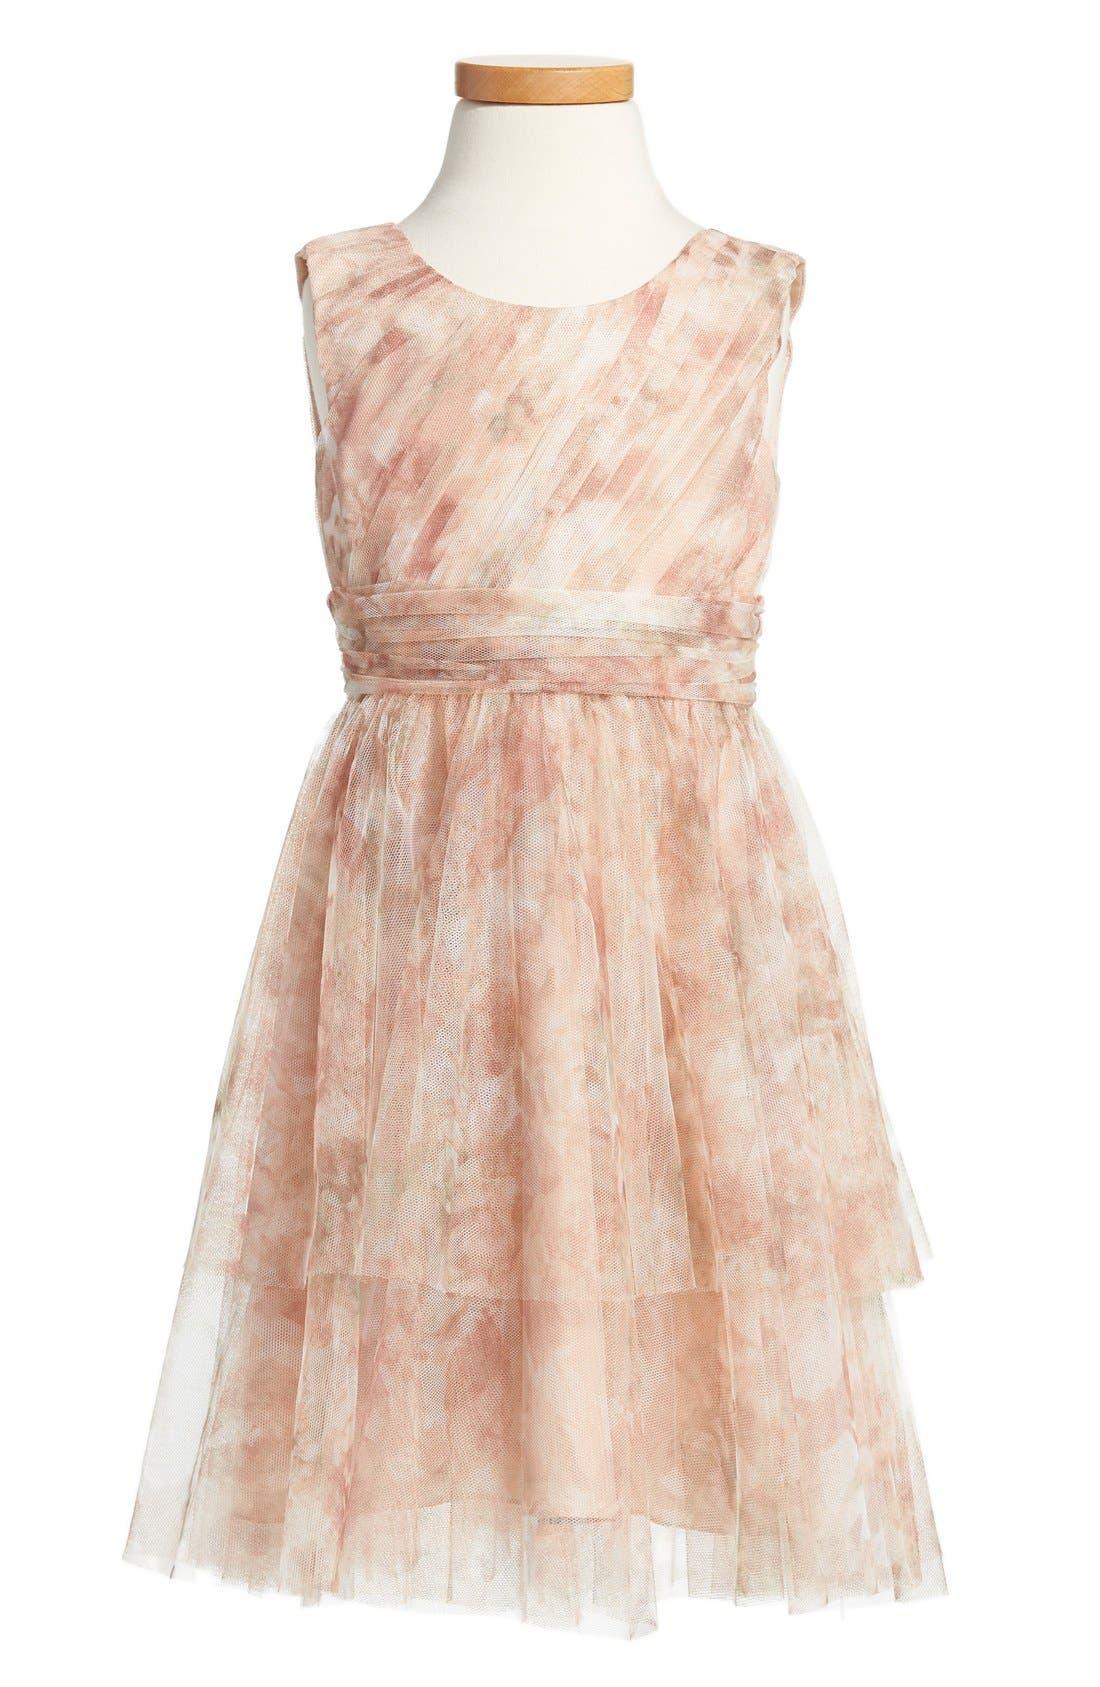 Etsy - Vintage Floral Tulle Dress,                         Main,                         color, Blush Multi